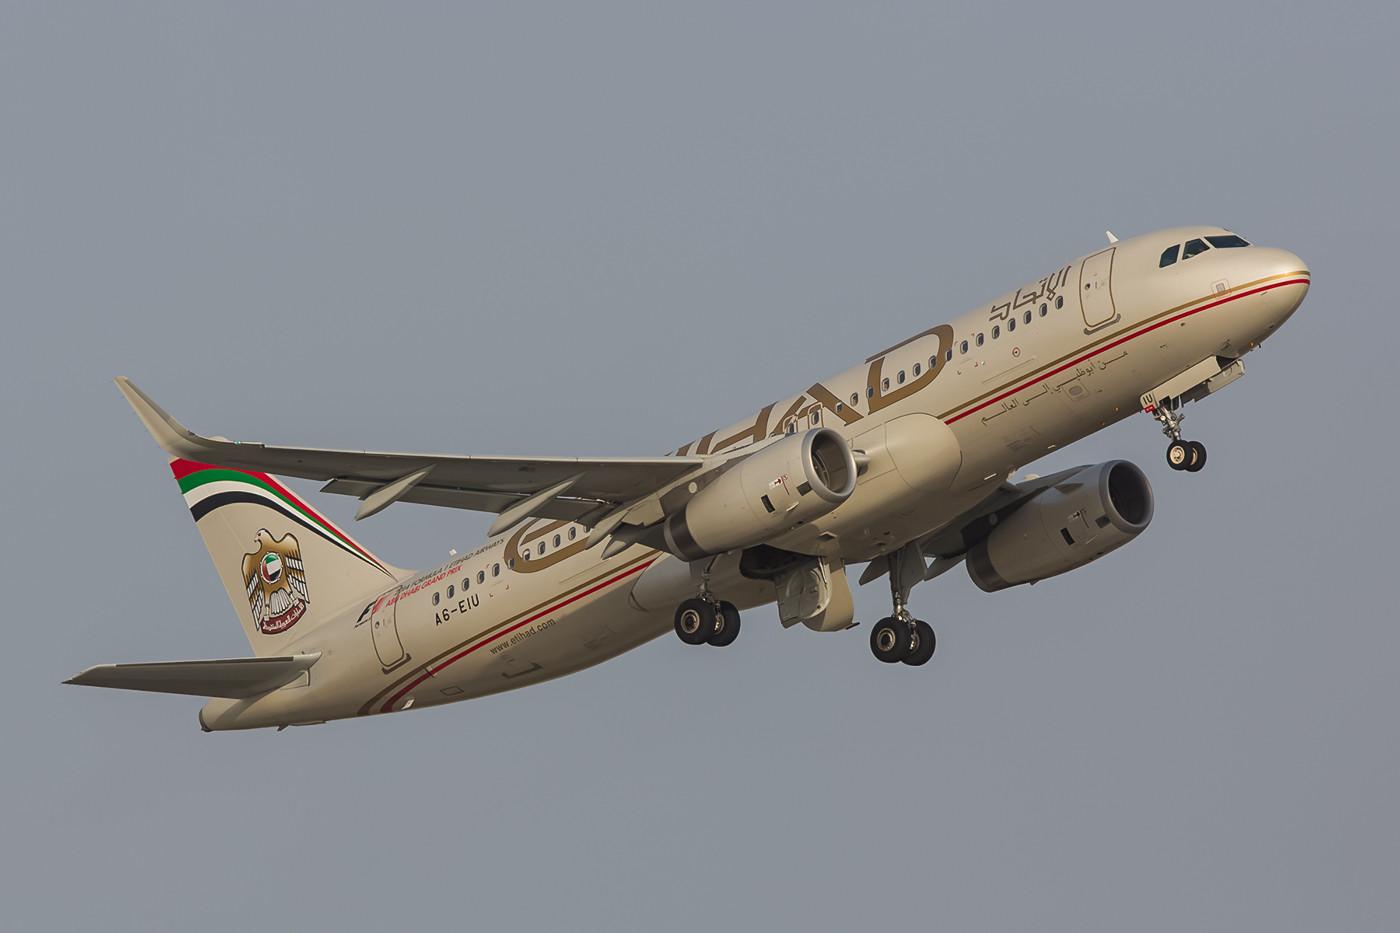 Ethiad Airbus A320 mit Sharklets.